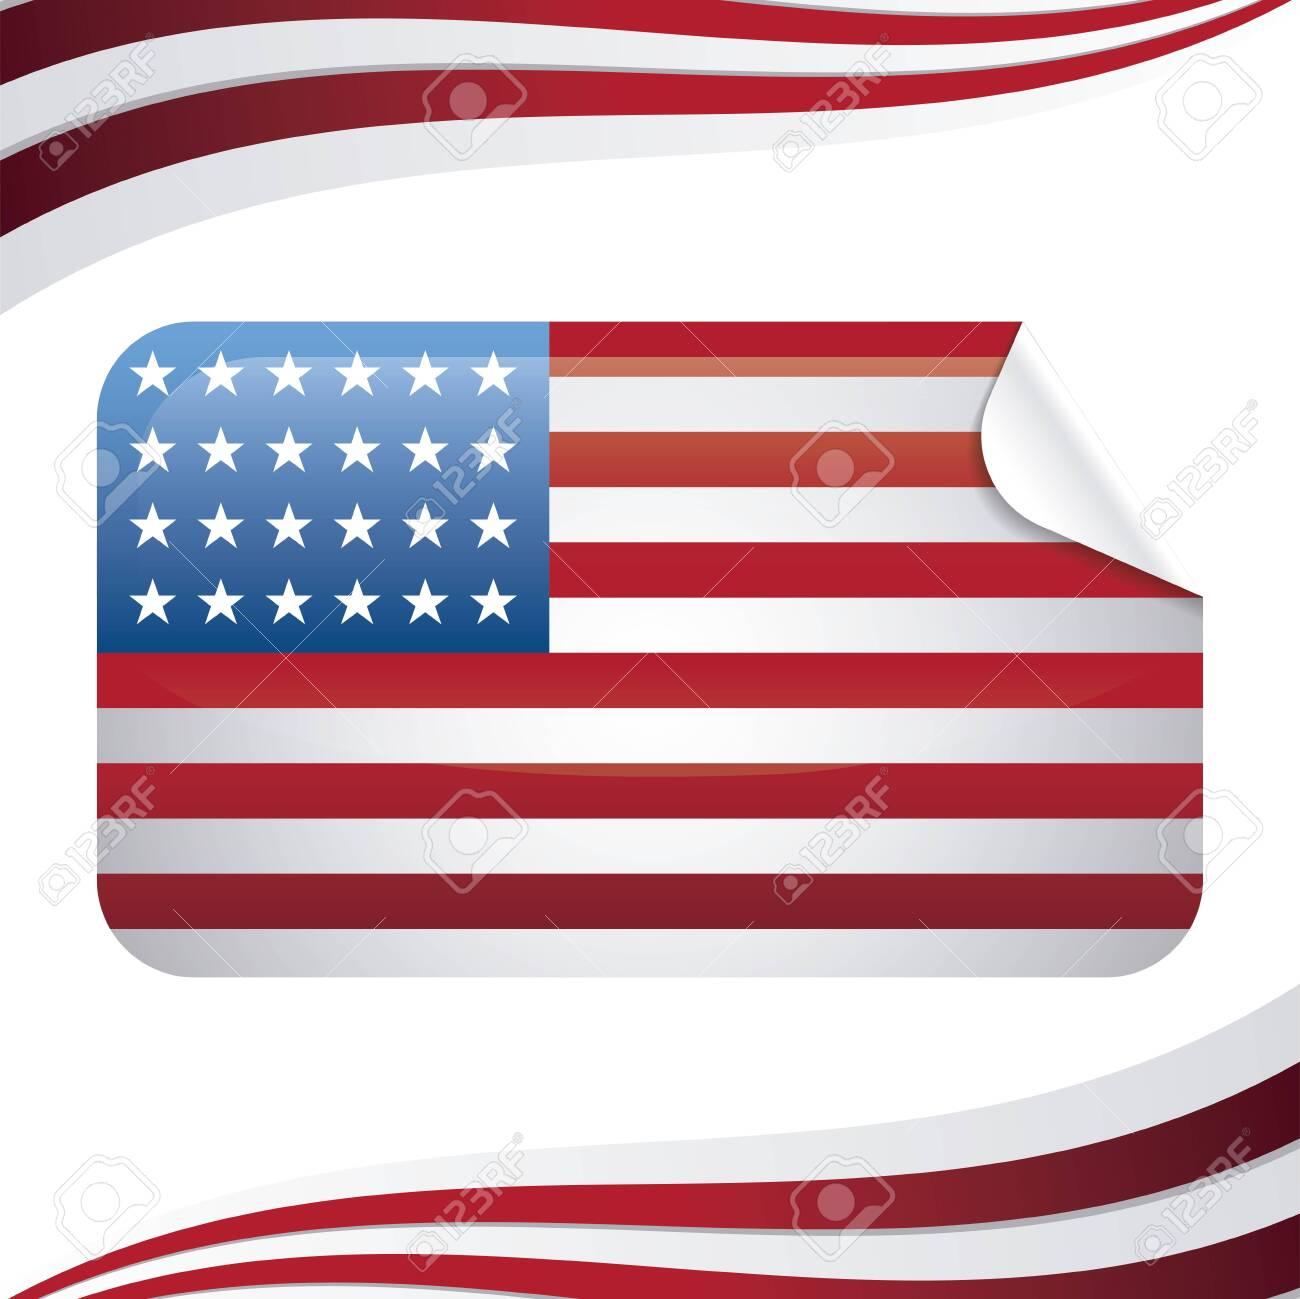 united state of american flag in rectangle shape vector illustration design - 153519135